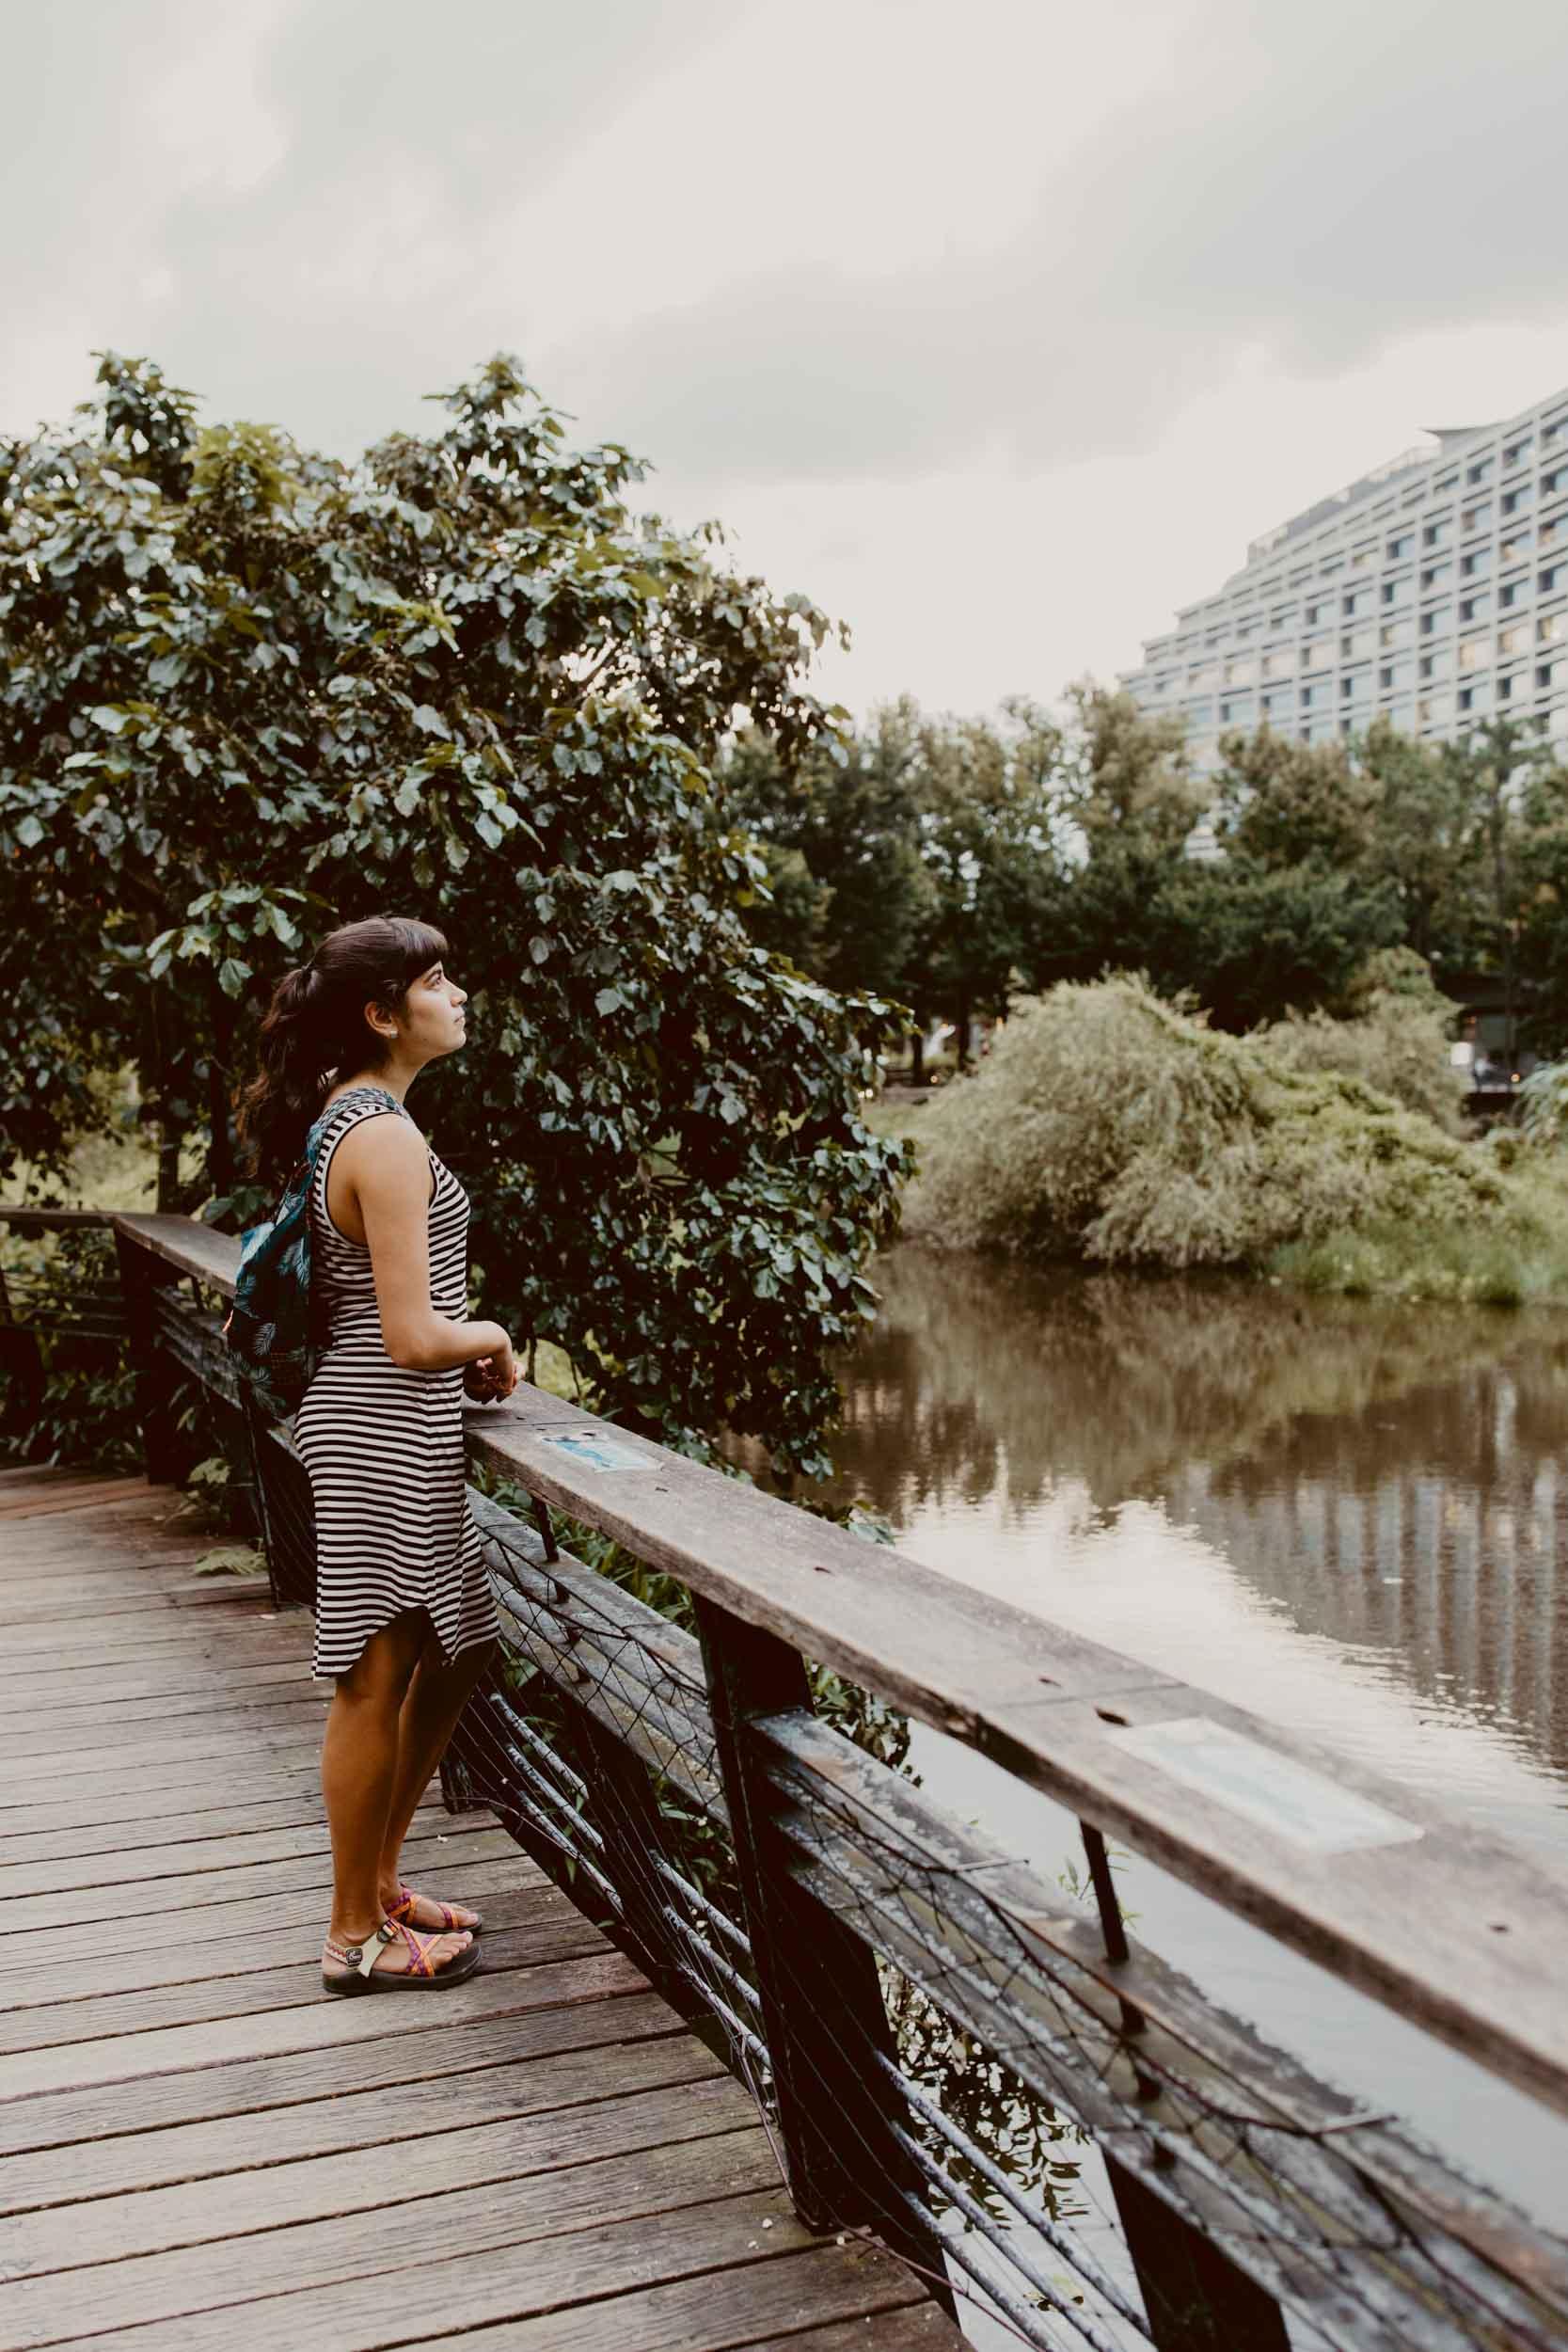 Miriam-Subbiah-taiwan-39.jpg